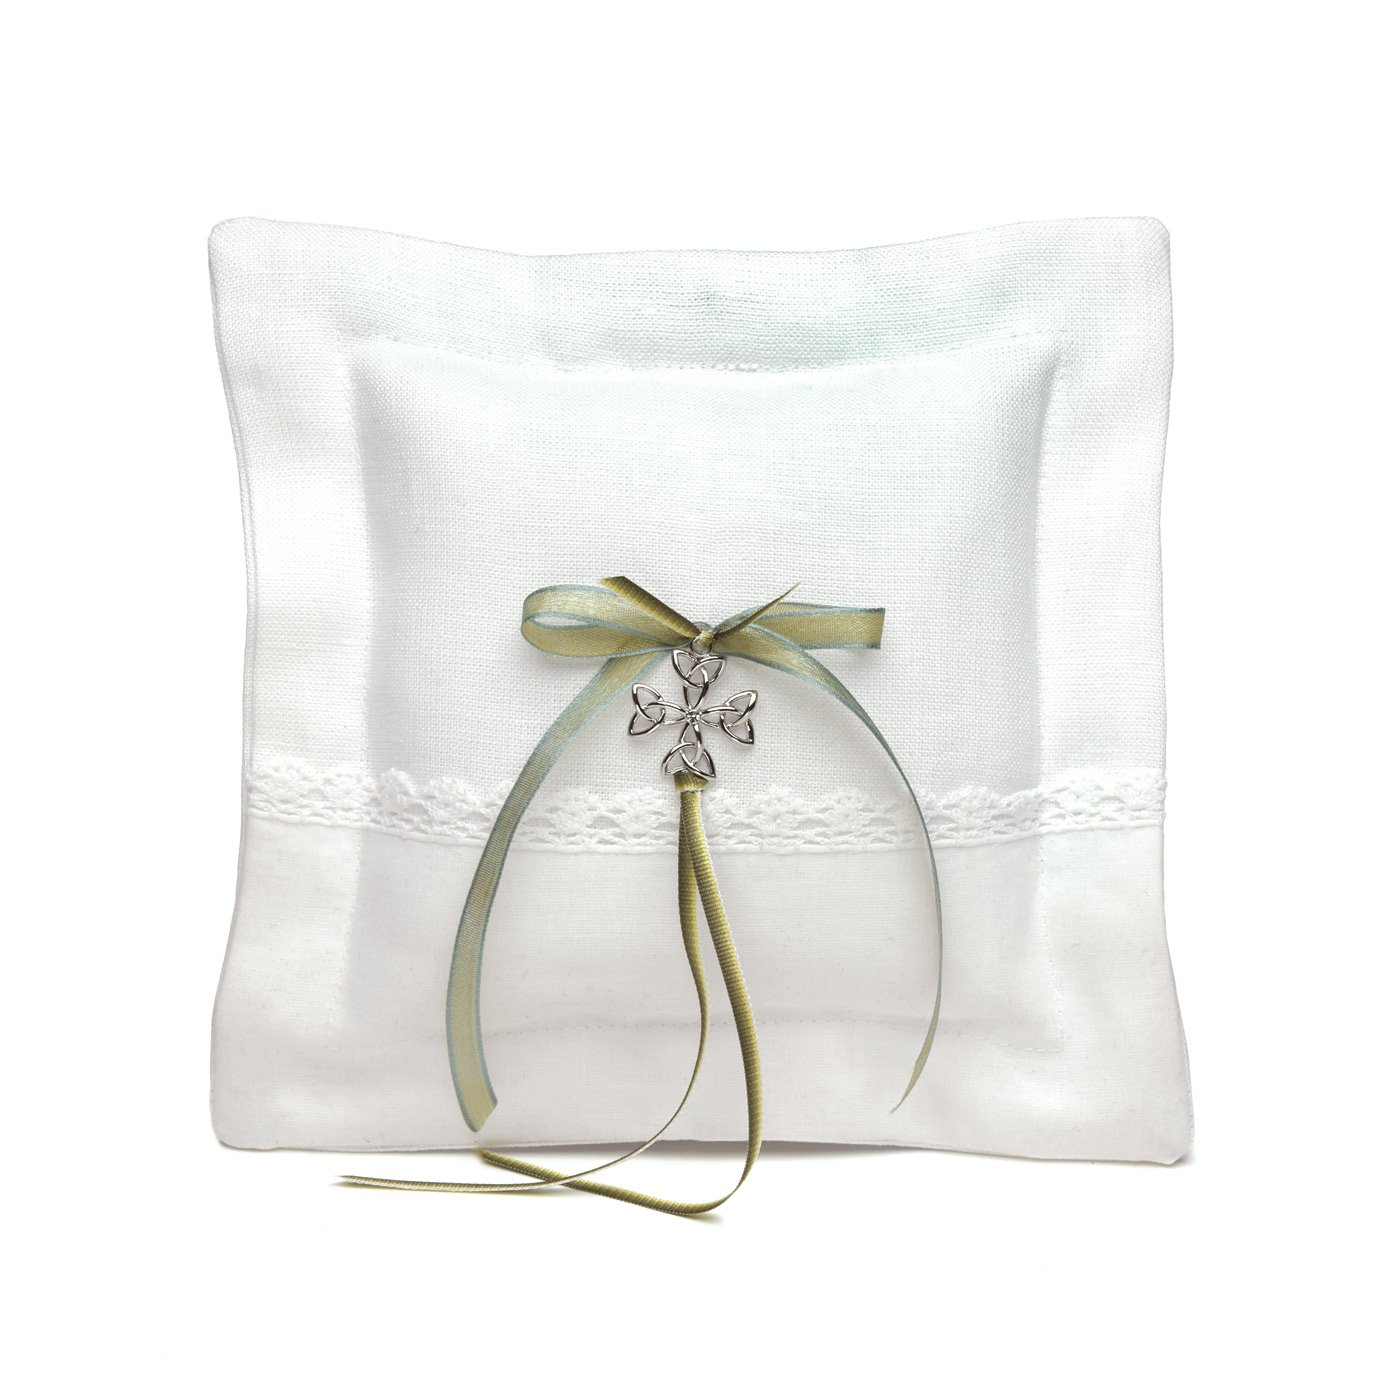 Weddingstar Celtic Charm Square Ring Pillow by Weddingstar Inc.